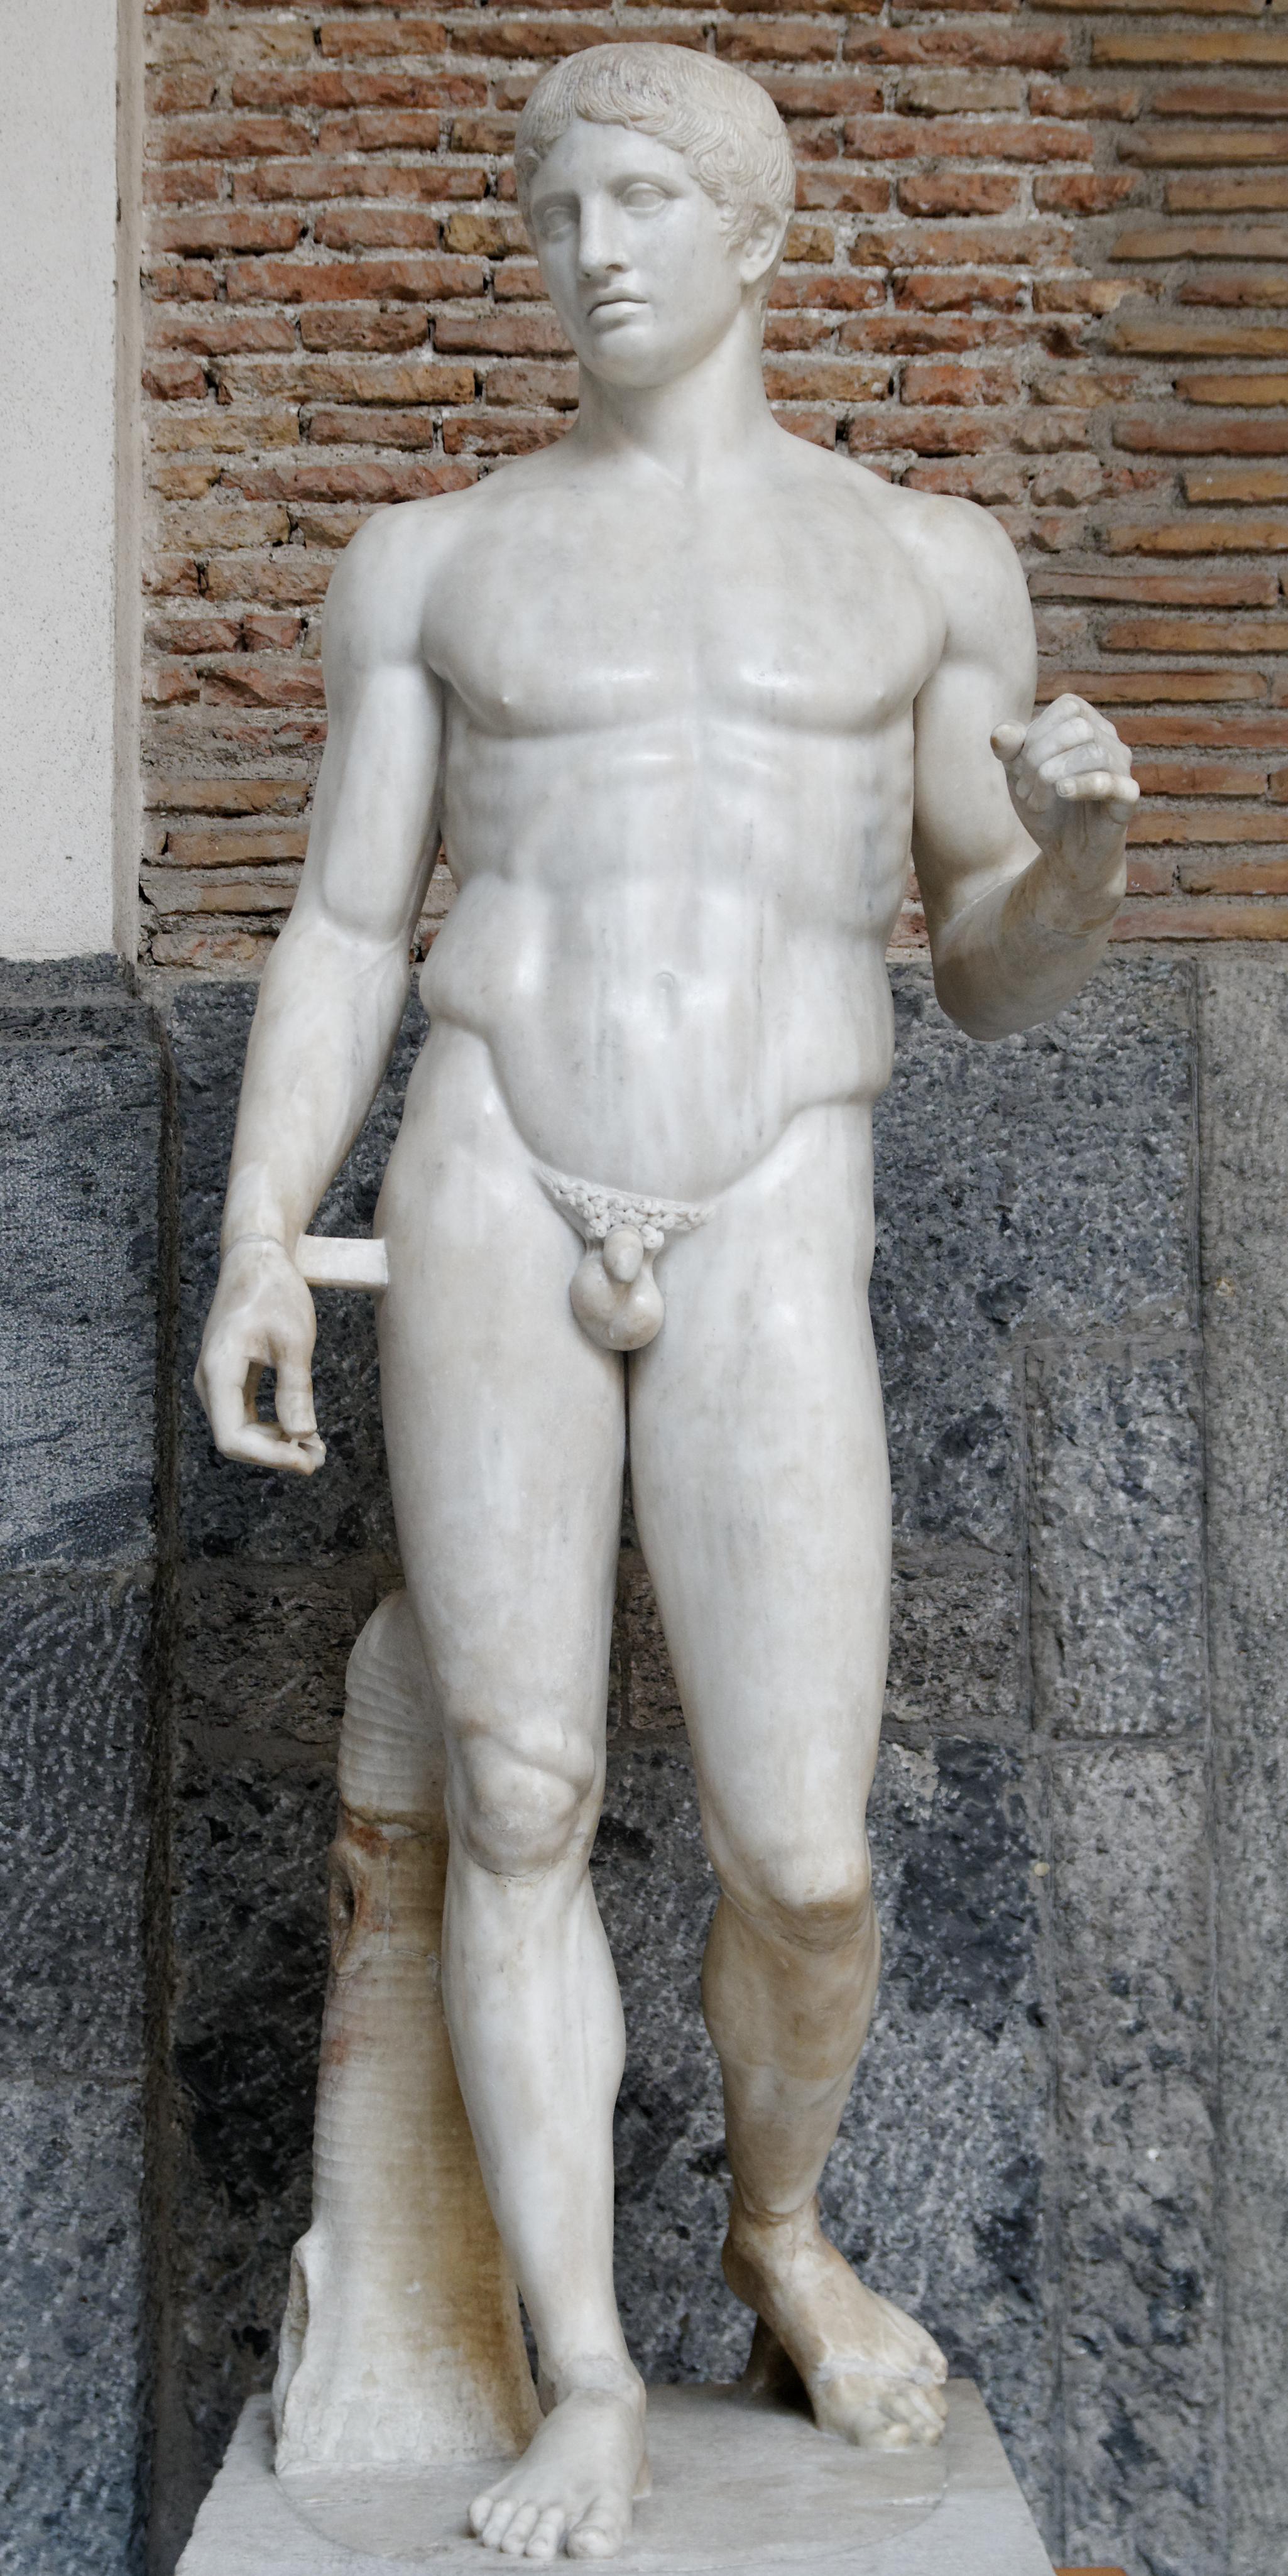 http://upload.wikimedia.org/wikipedia/commons/2/2c/Doryphoros_MAN_Napoli_Inv6011.jpg